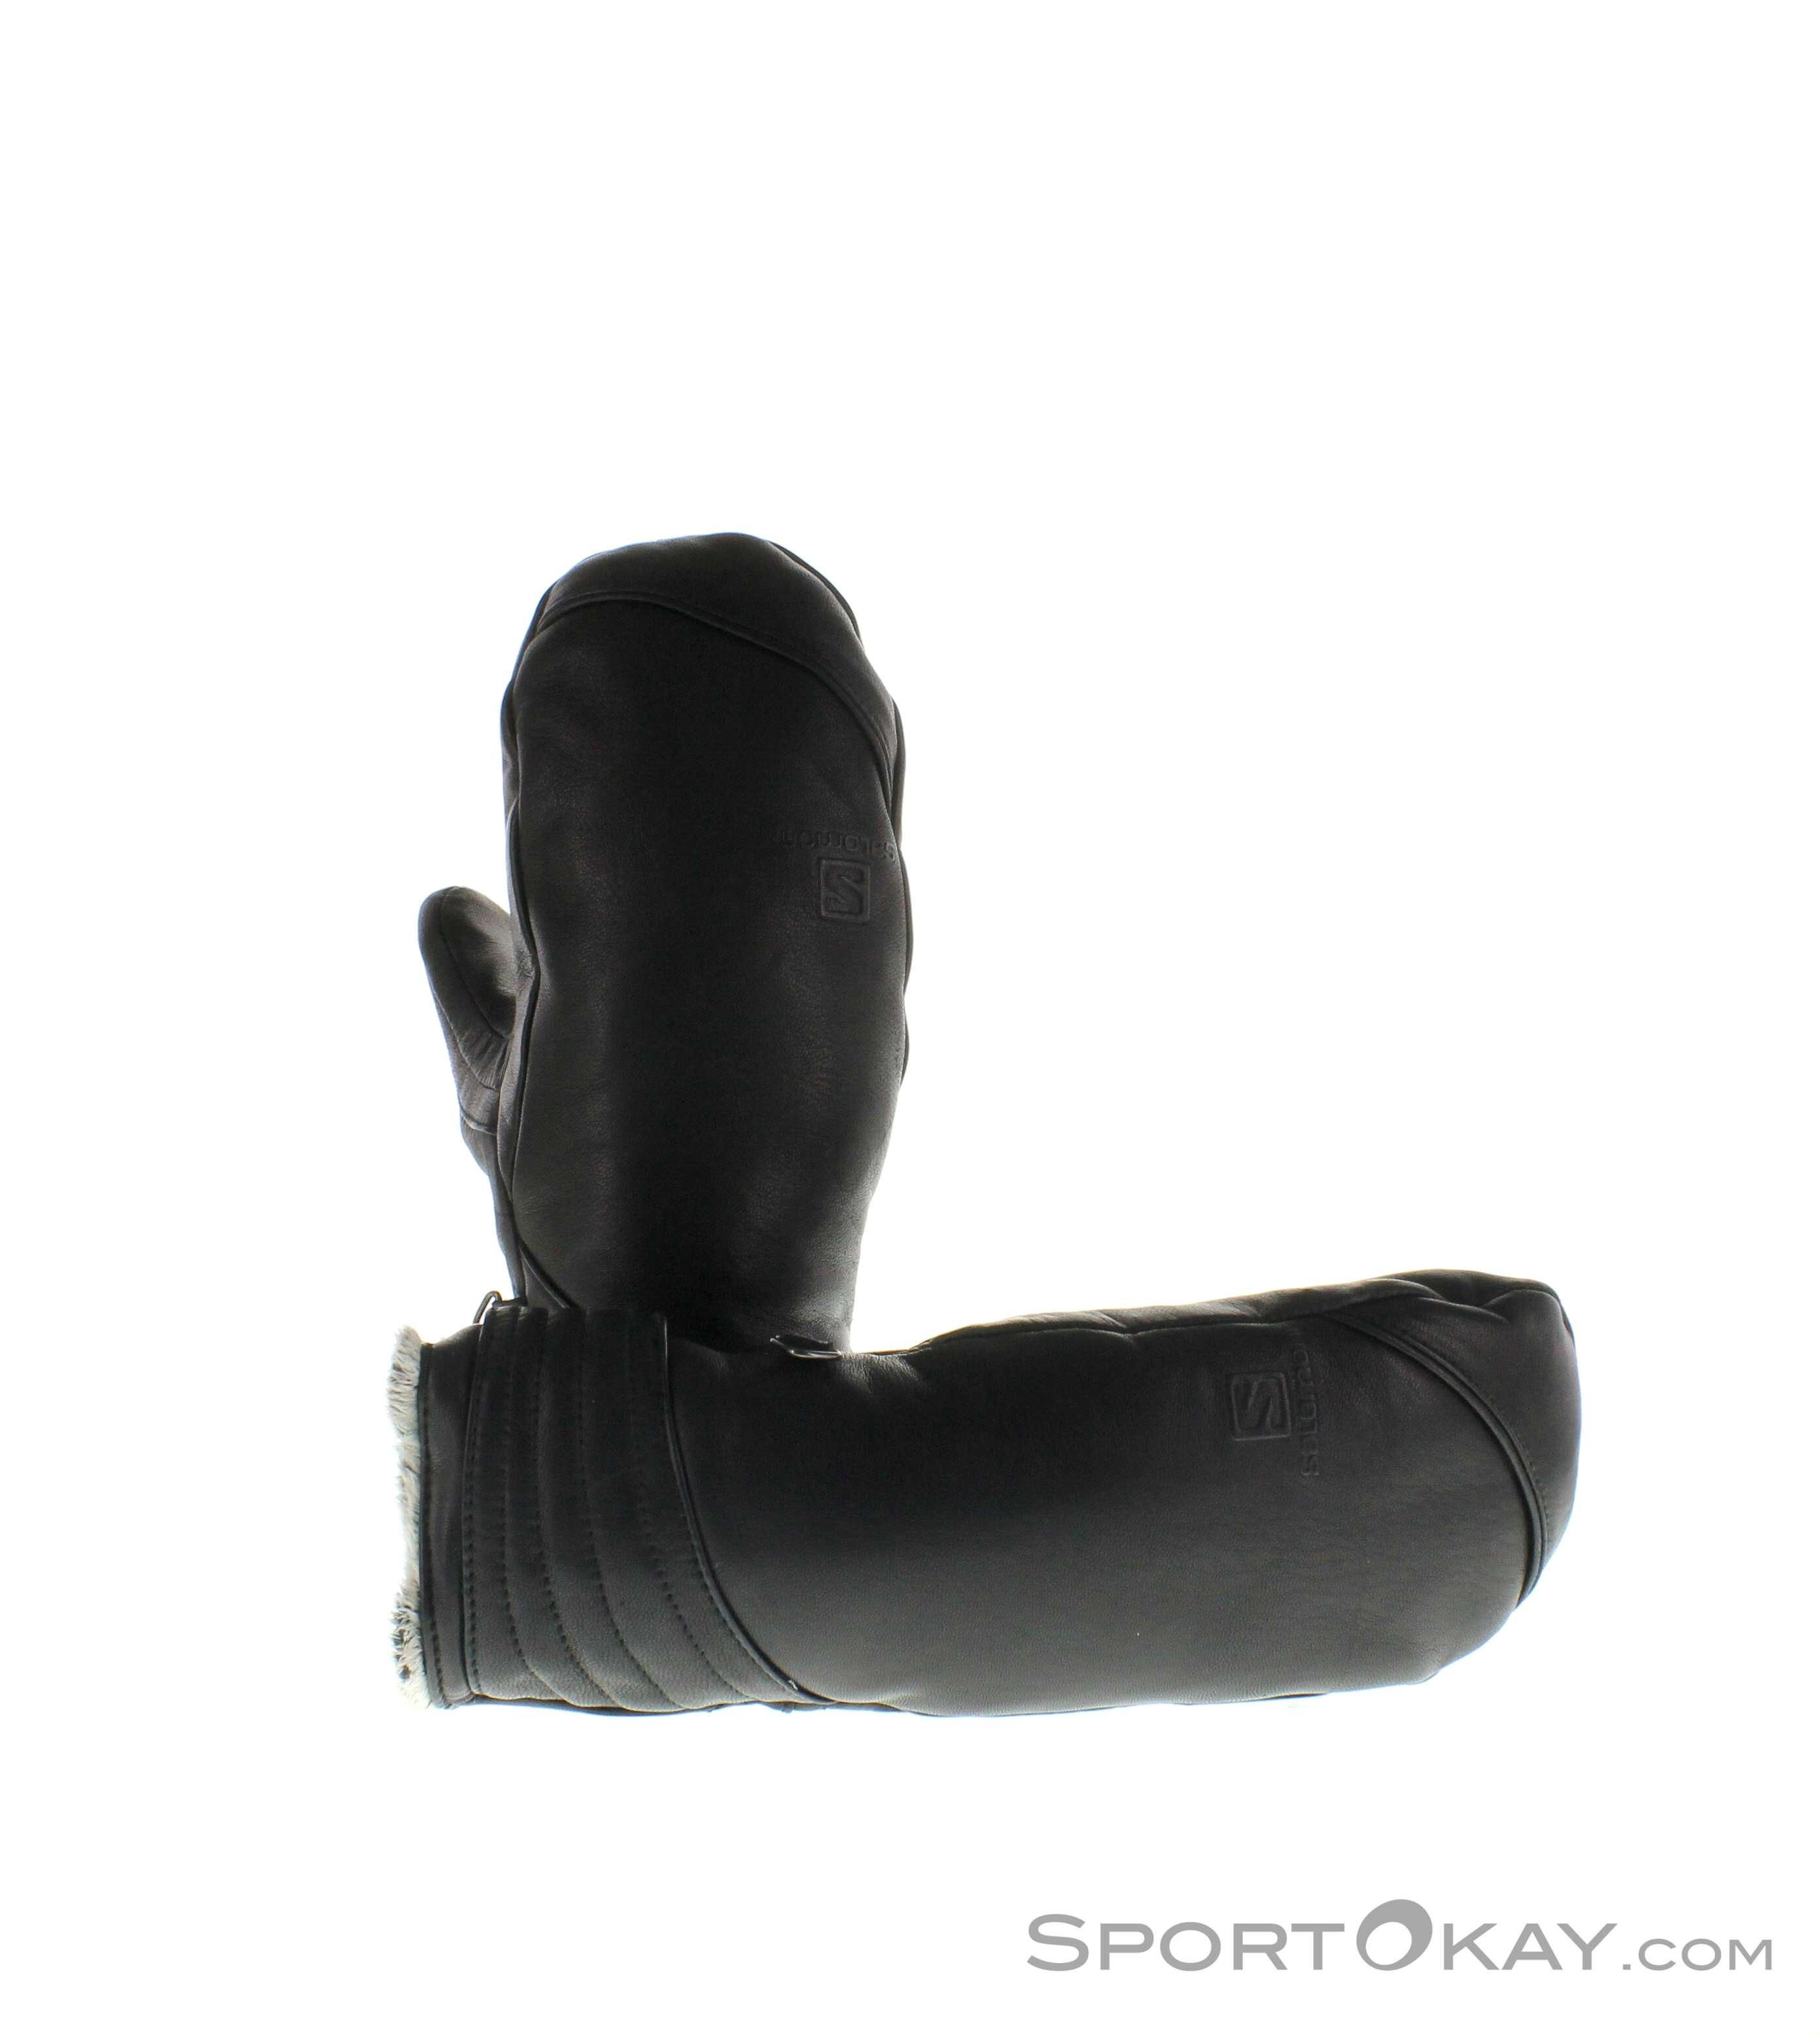 Salomon Native Mitten Damen Handschuhe-Schwarz-M